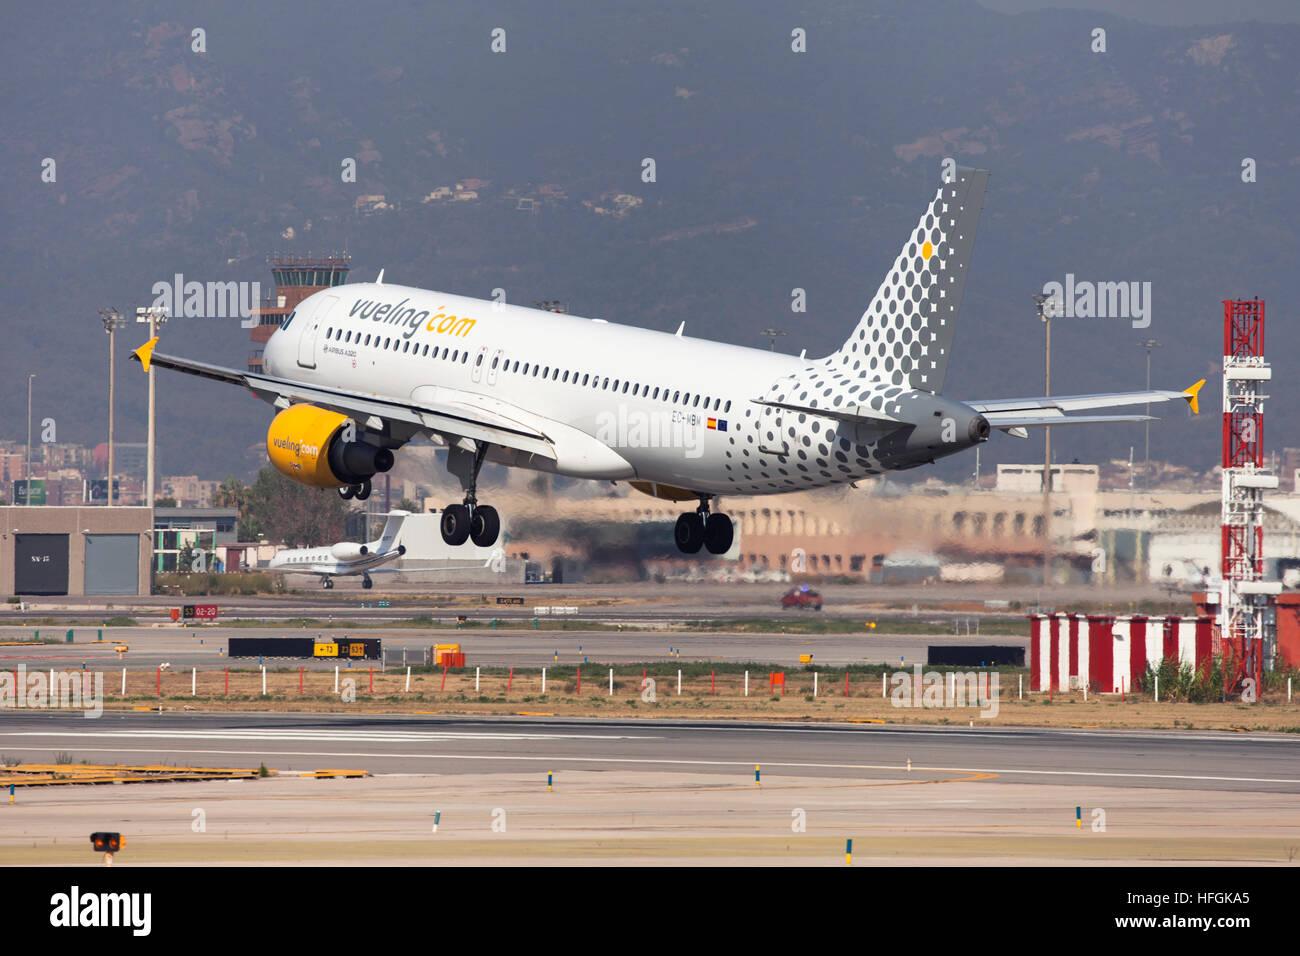 Vueling Airbus A320 landing at El Prat Airport in Barcelona, Spain. - Stock Image